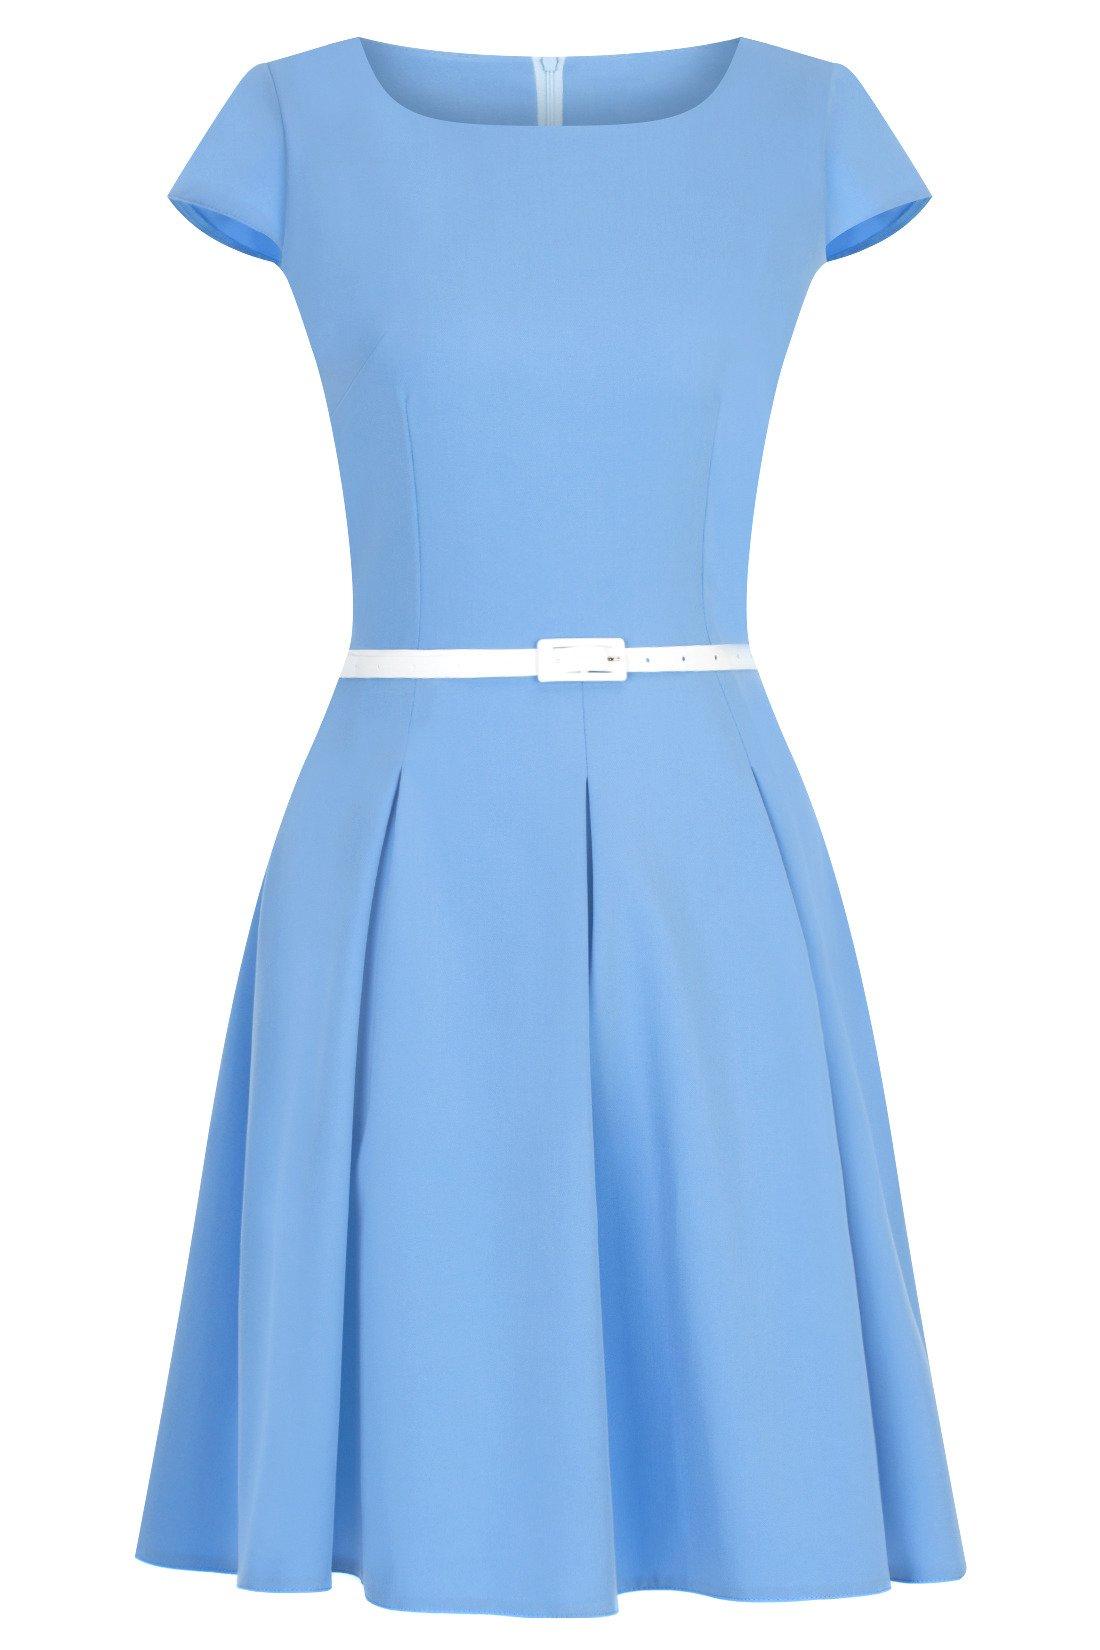 841c5b8f8d Sukienka Gotta niebieska z paskiem w talii Kliknij